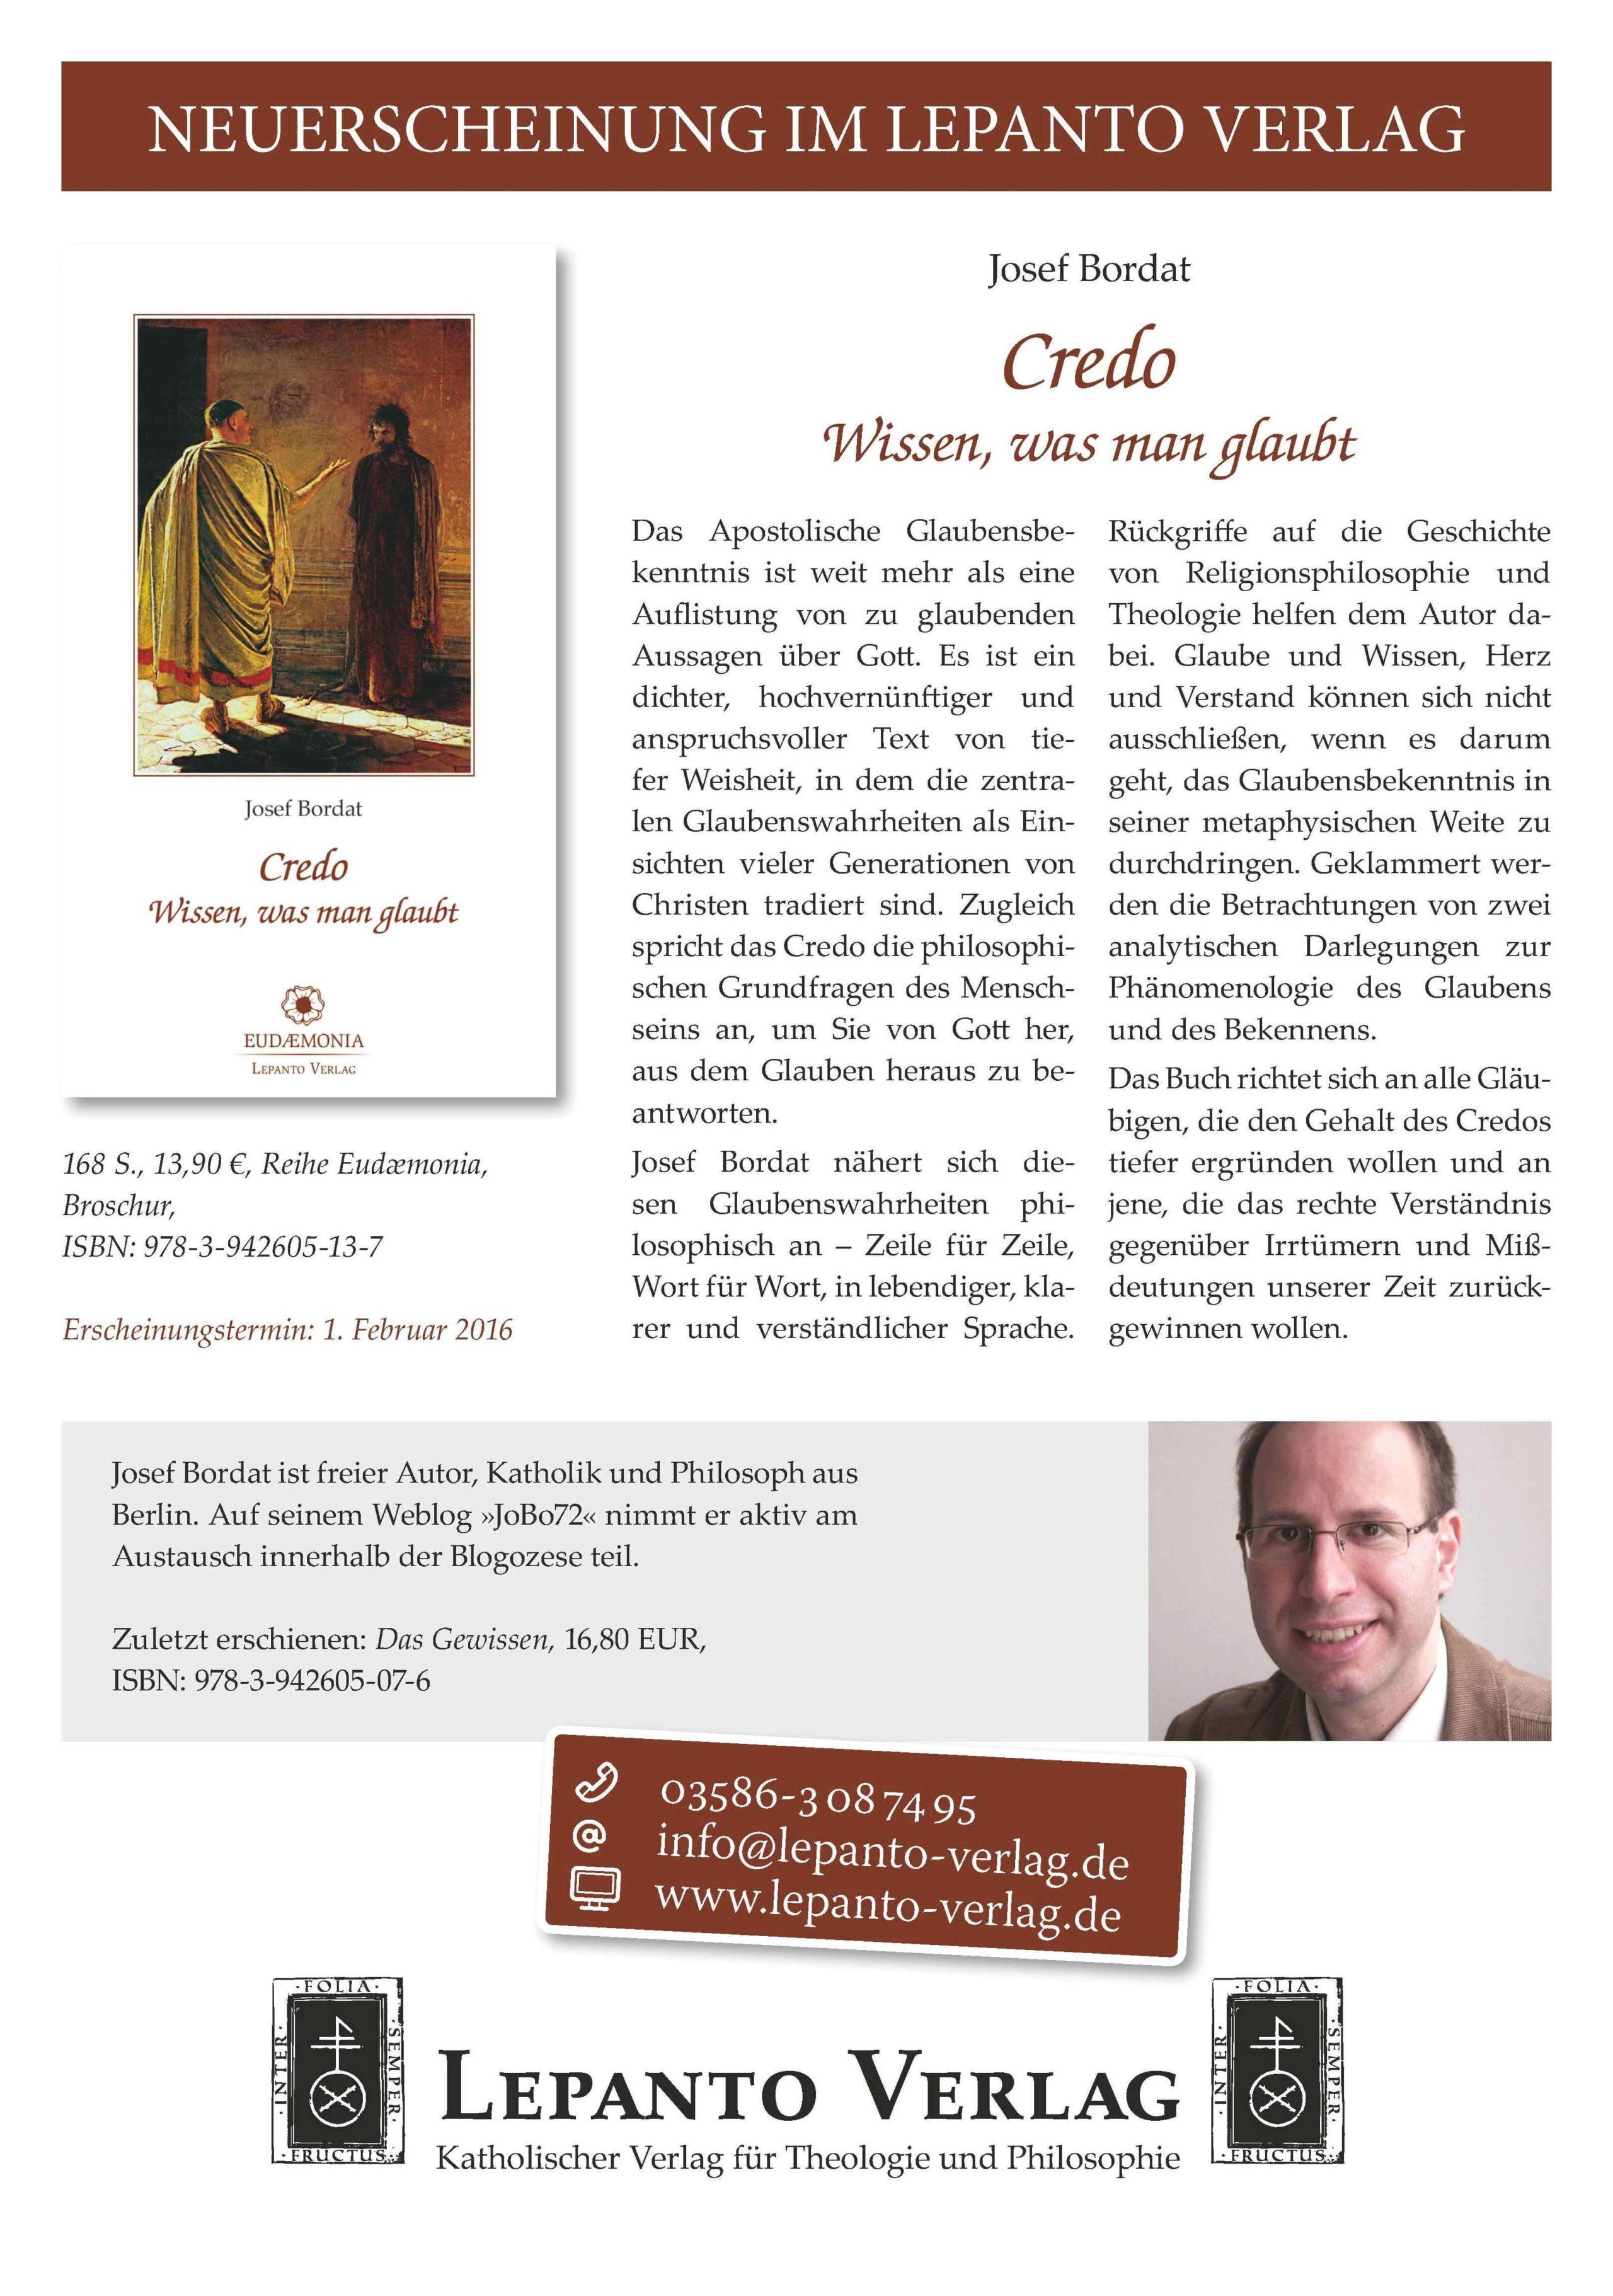 Bordat Credo 2-2016 Lepanto Verlag